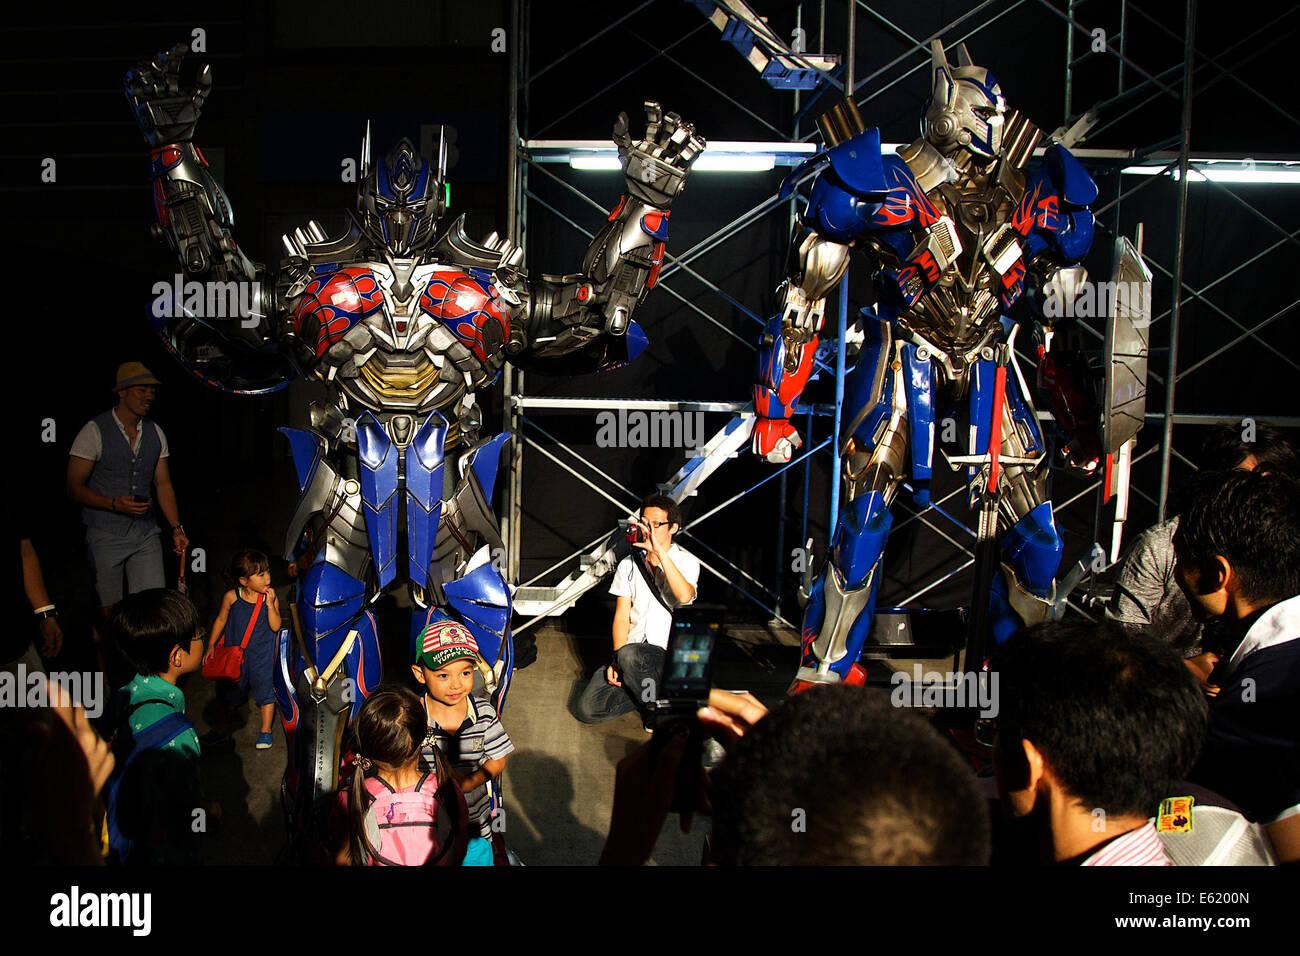 Transformers Optimus Prime Stock Photos & Transformers Optimus Prime